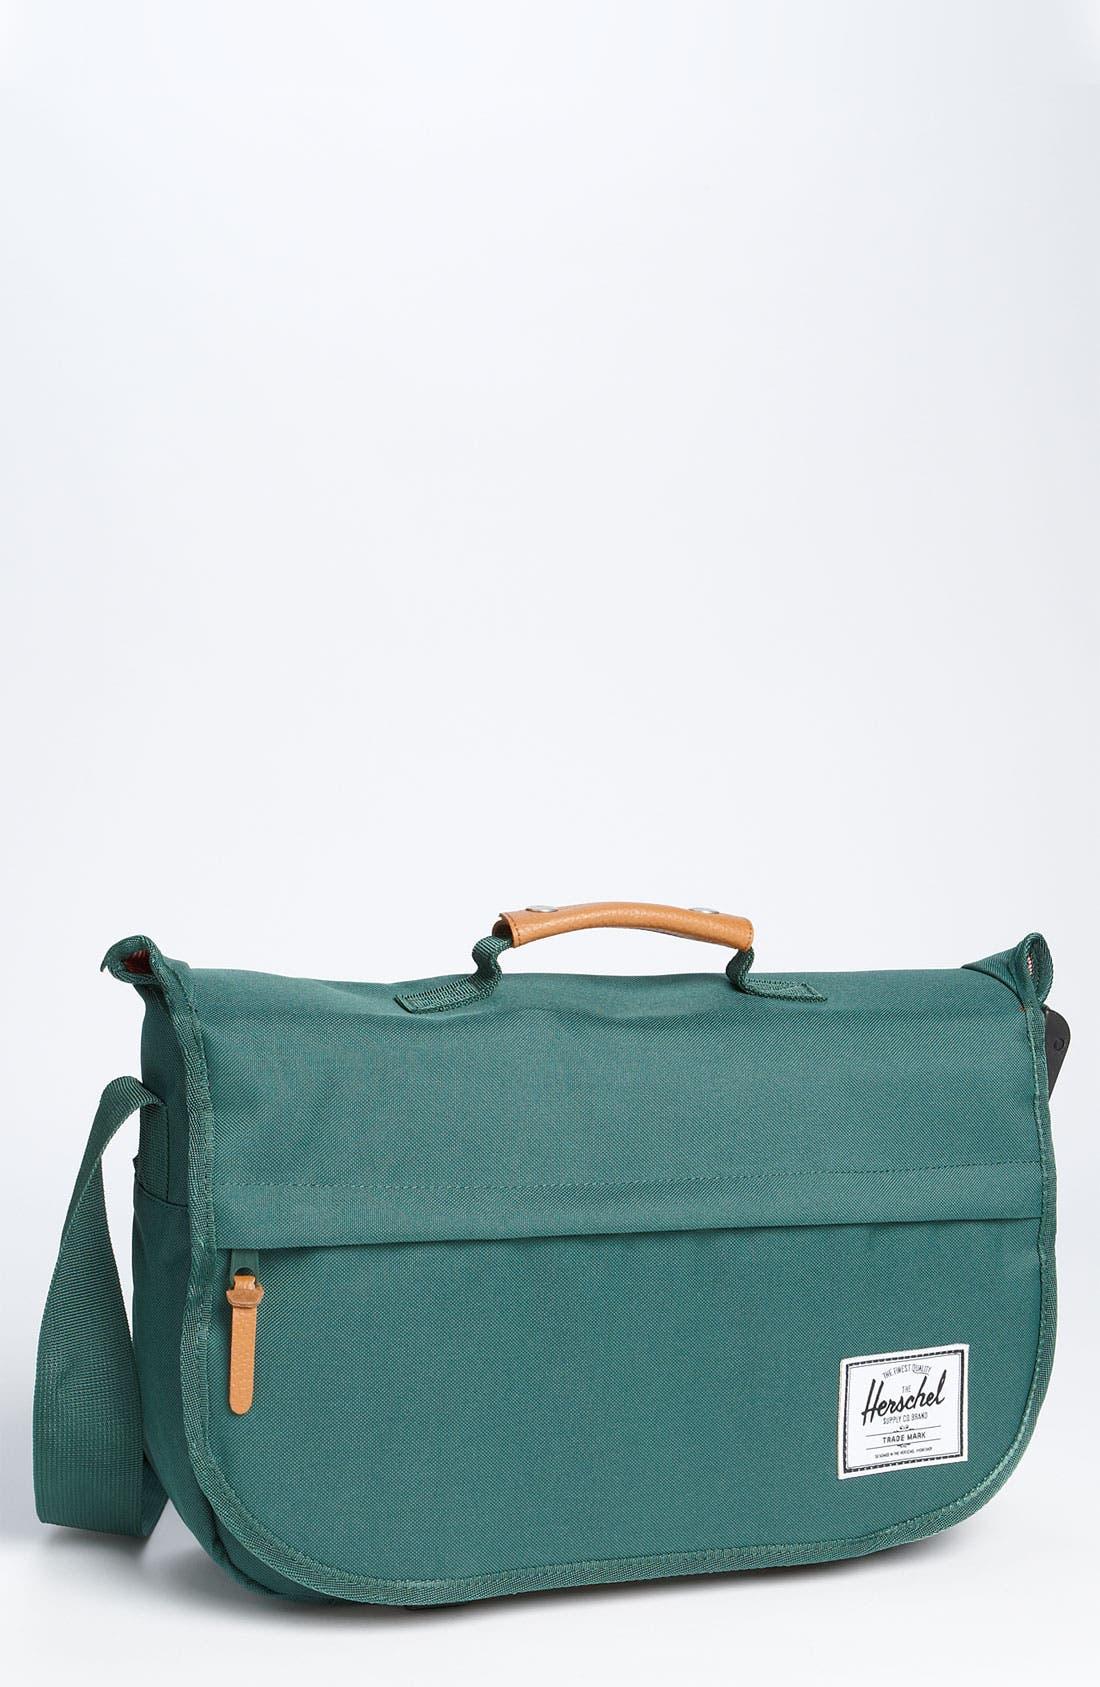 Alternate Image 1 Selected - Herschel Supply Co. 'Mill' Messenger Bag